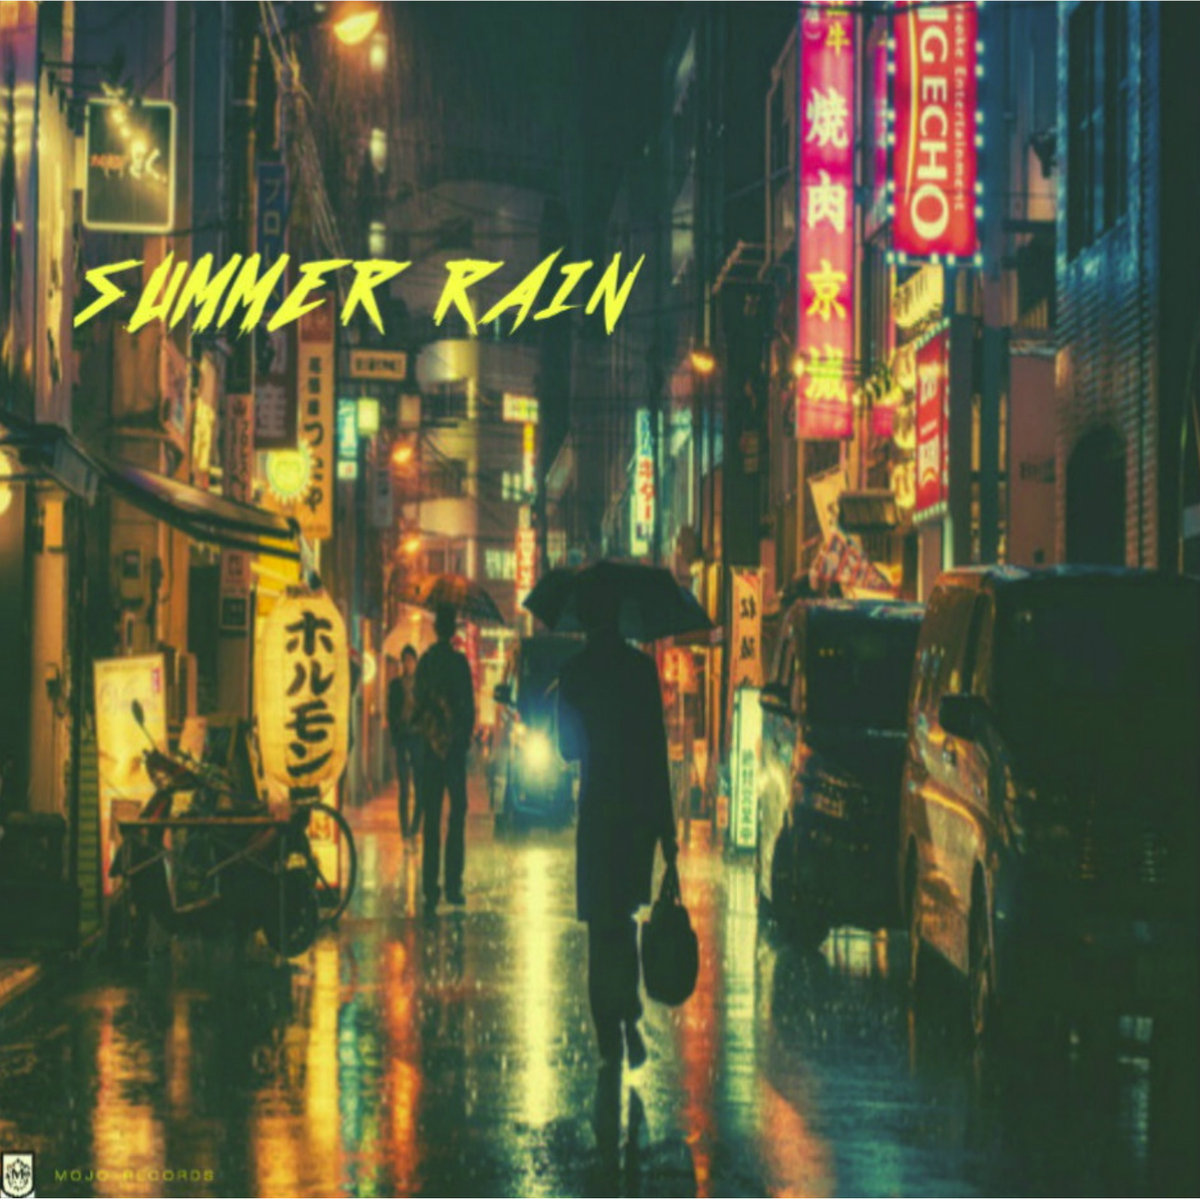 The Duke - 'Summer Rain' Recorded @ La Cueva Studios Produced/Engineered/Mixed - Dan Frizza